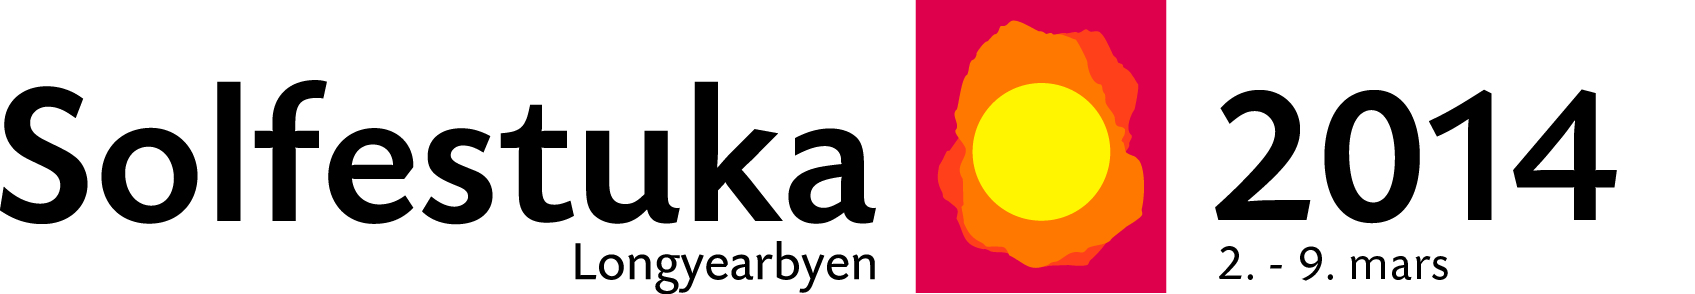 Solfestuka 2014 Logo.jpg